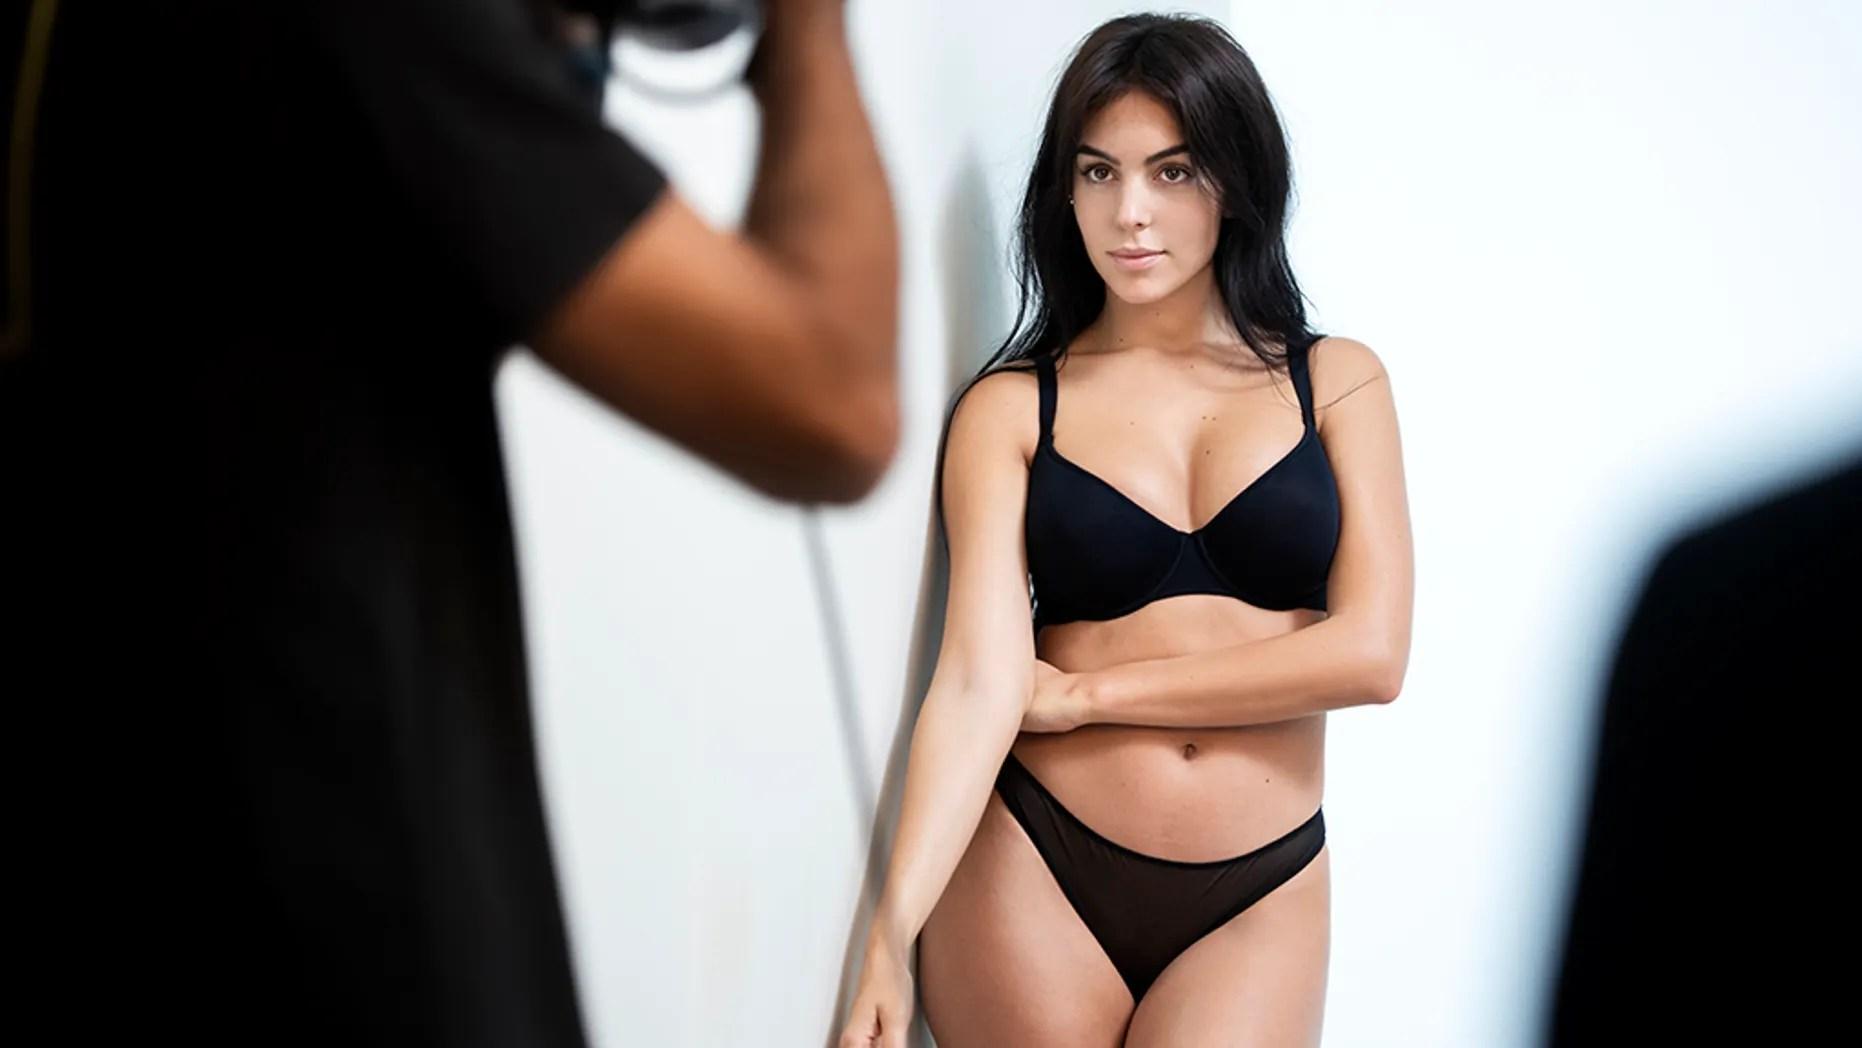 Model Georgina Rodriguez Shows Off Killer Curves In New